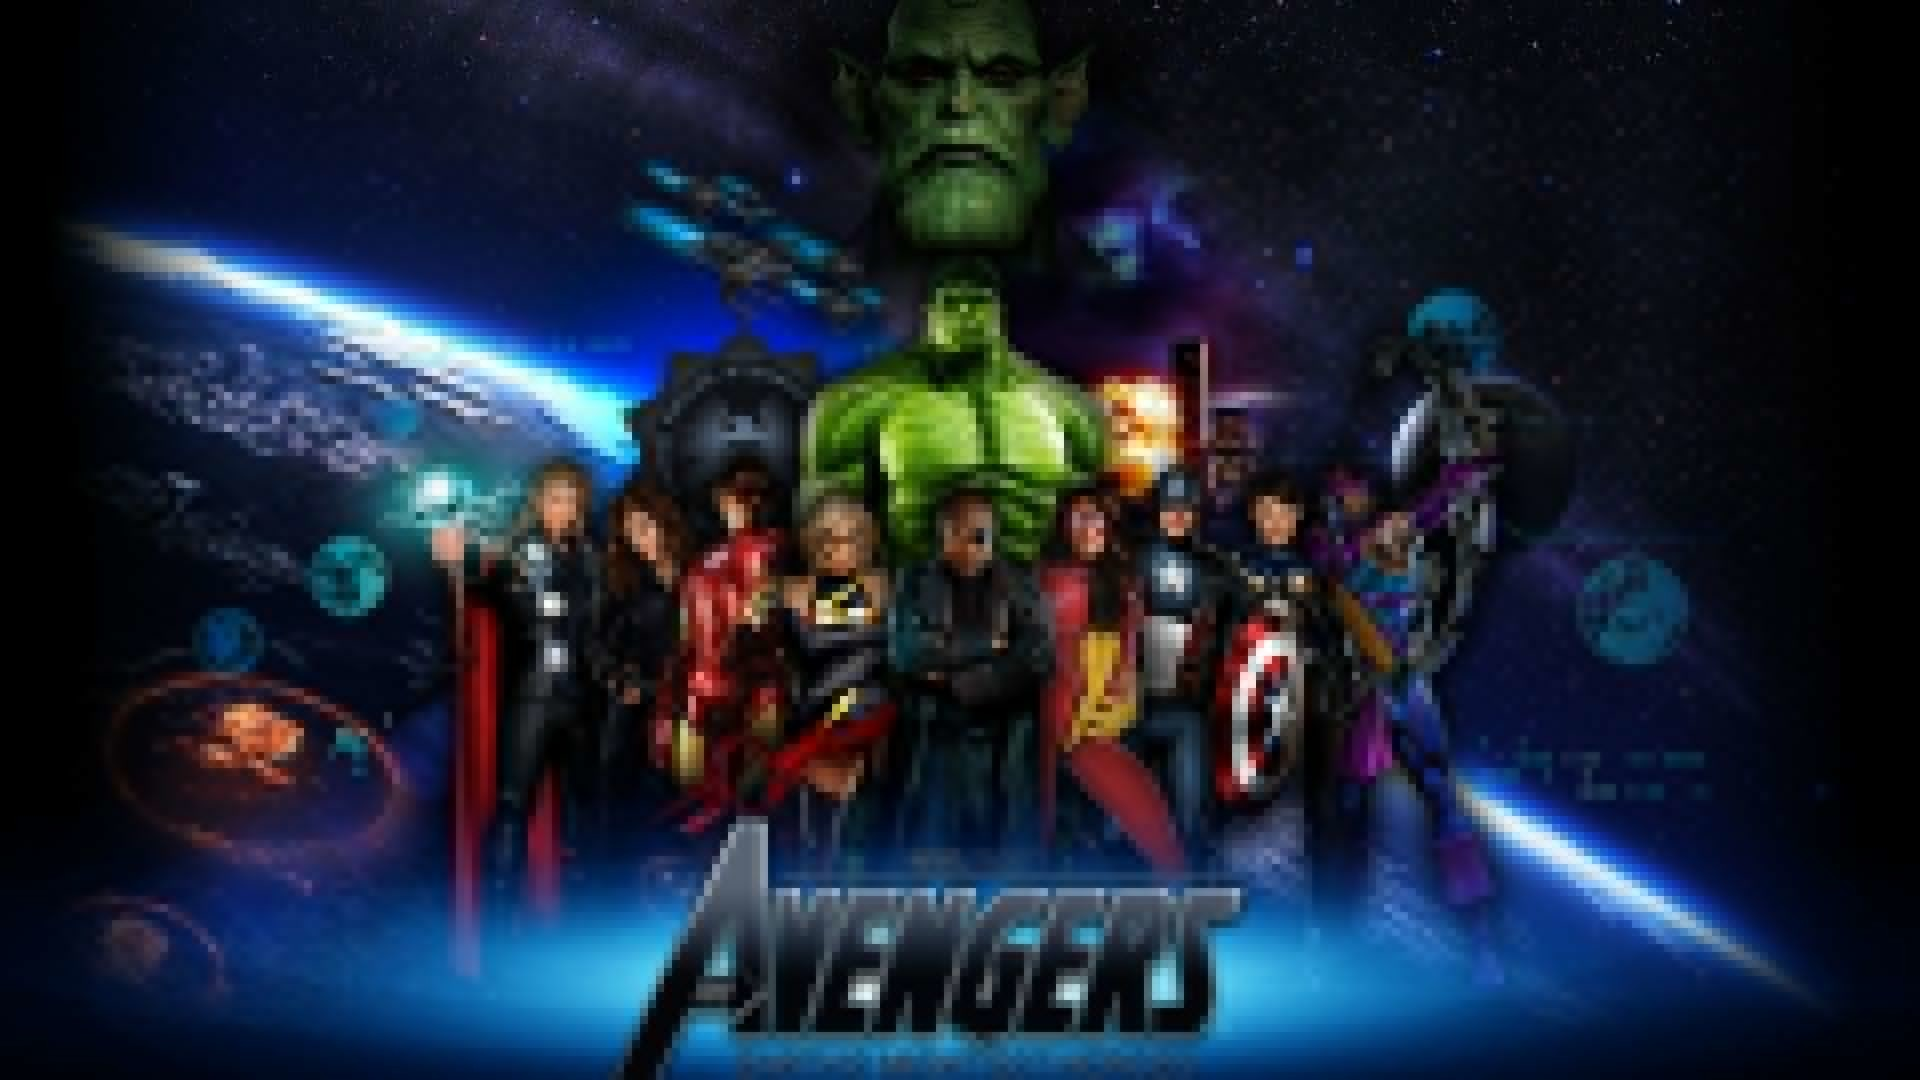 avengers-wallpapers-iron-man-marvel-nick-fury-thor-